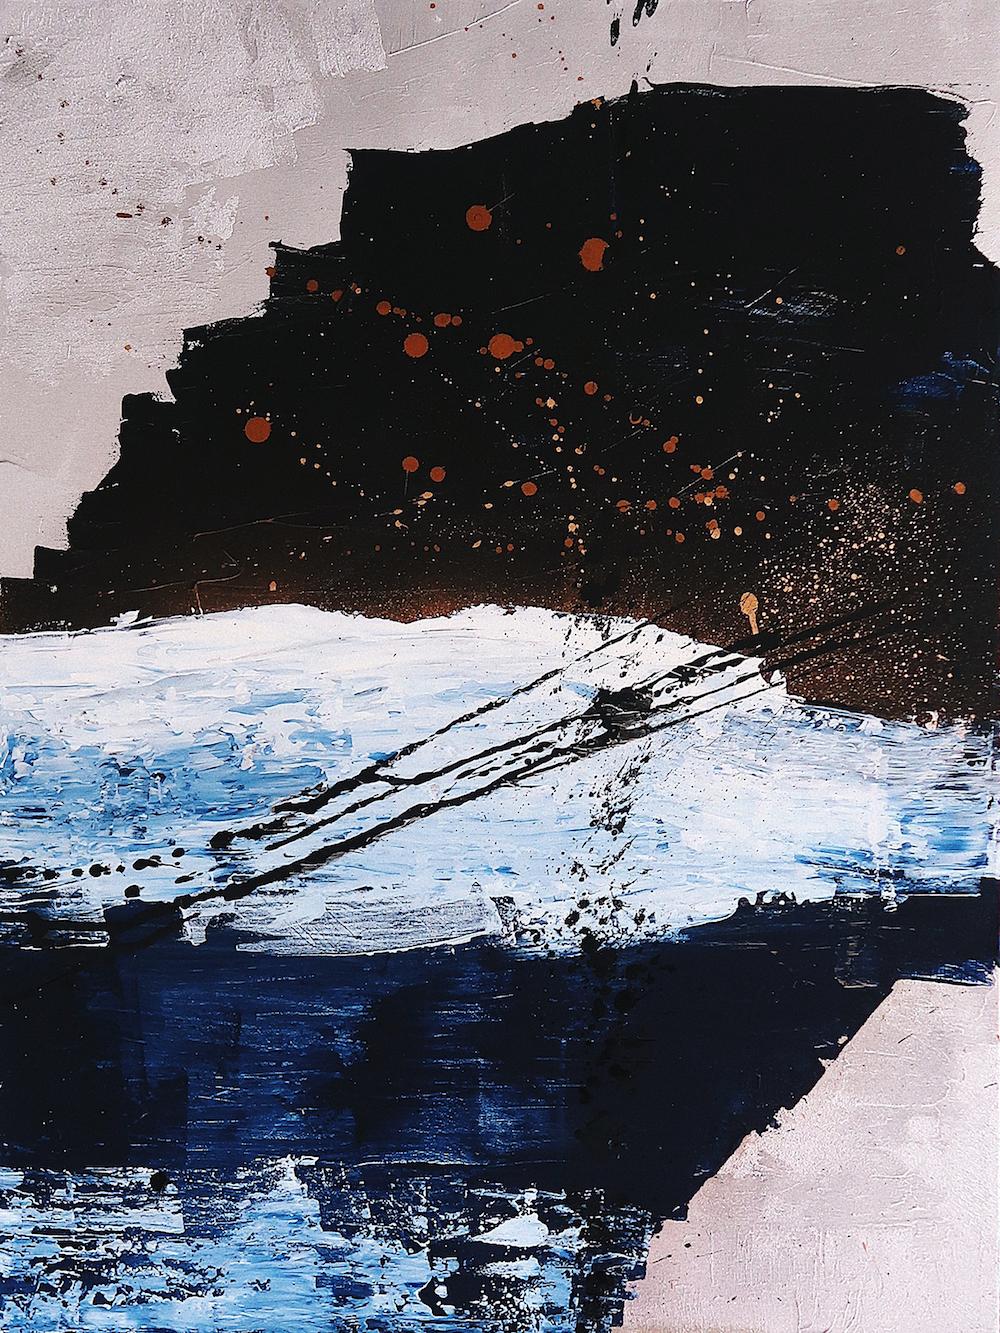 Seeking sunrises during storms - Bondi Icebergs during a stormy nightAcrylic on canvas30